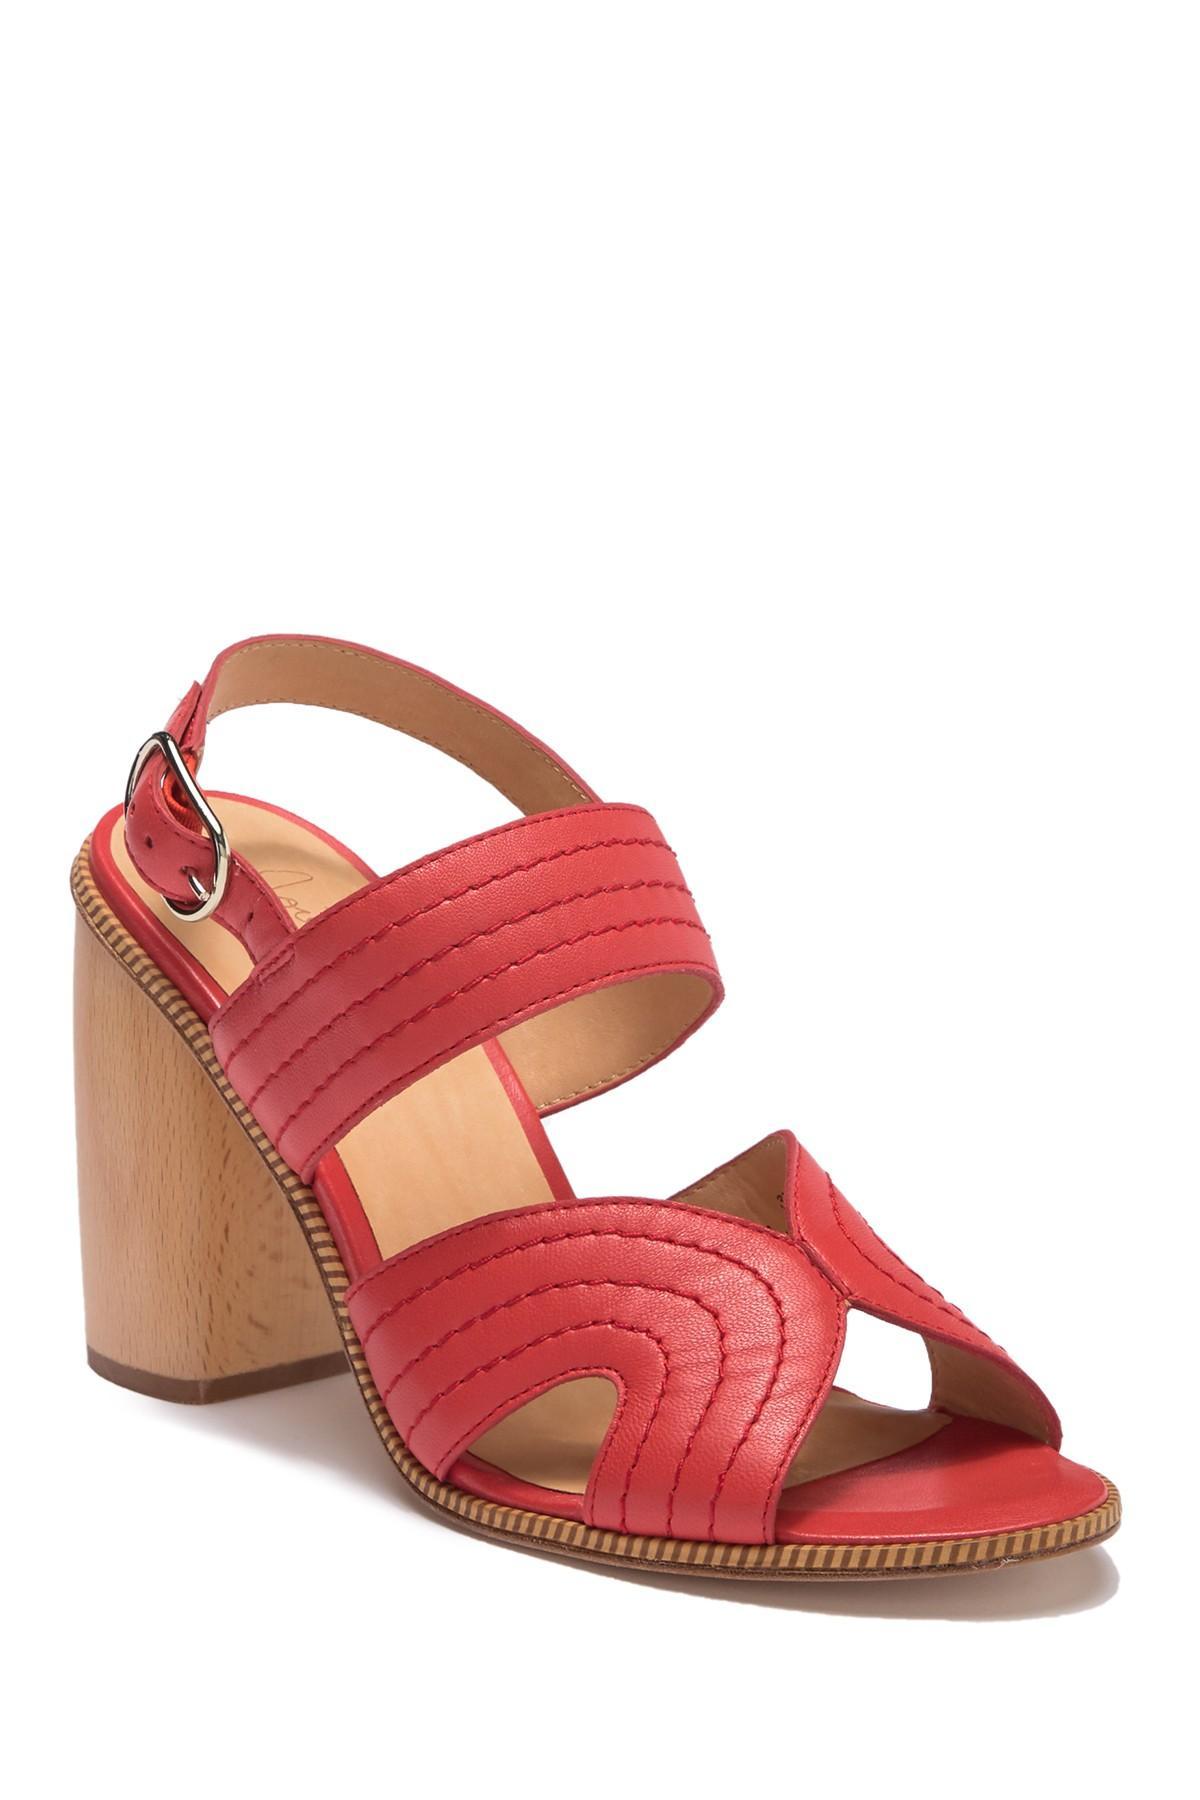 0ed84549417 Joie. Women s Red Aforleen Leather Slingback Strap Heeled Sandal.  328  170  From Nordstrom Rack